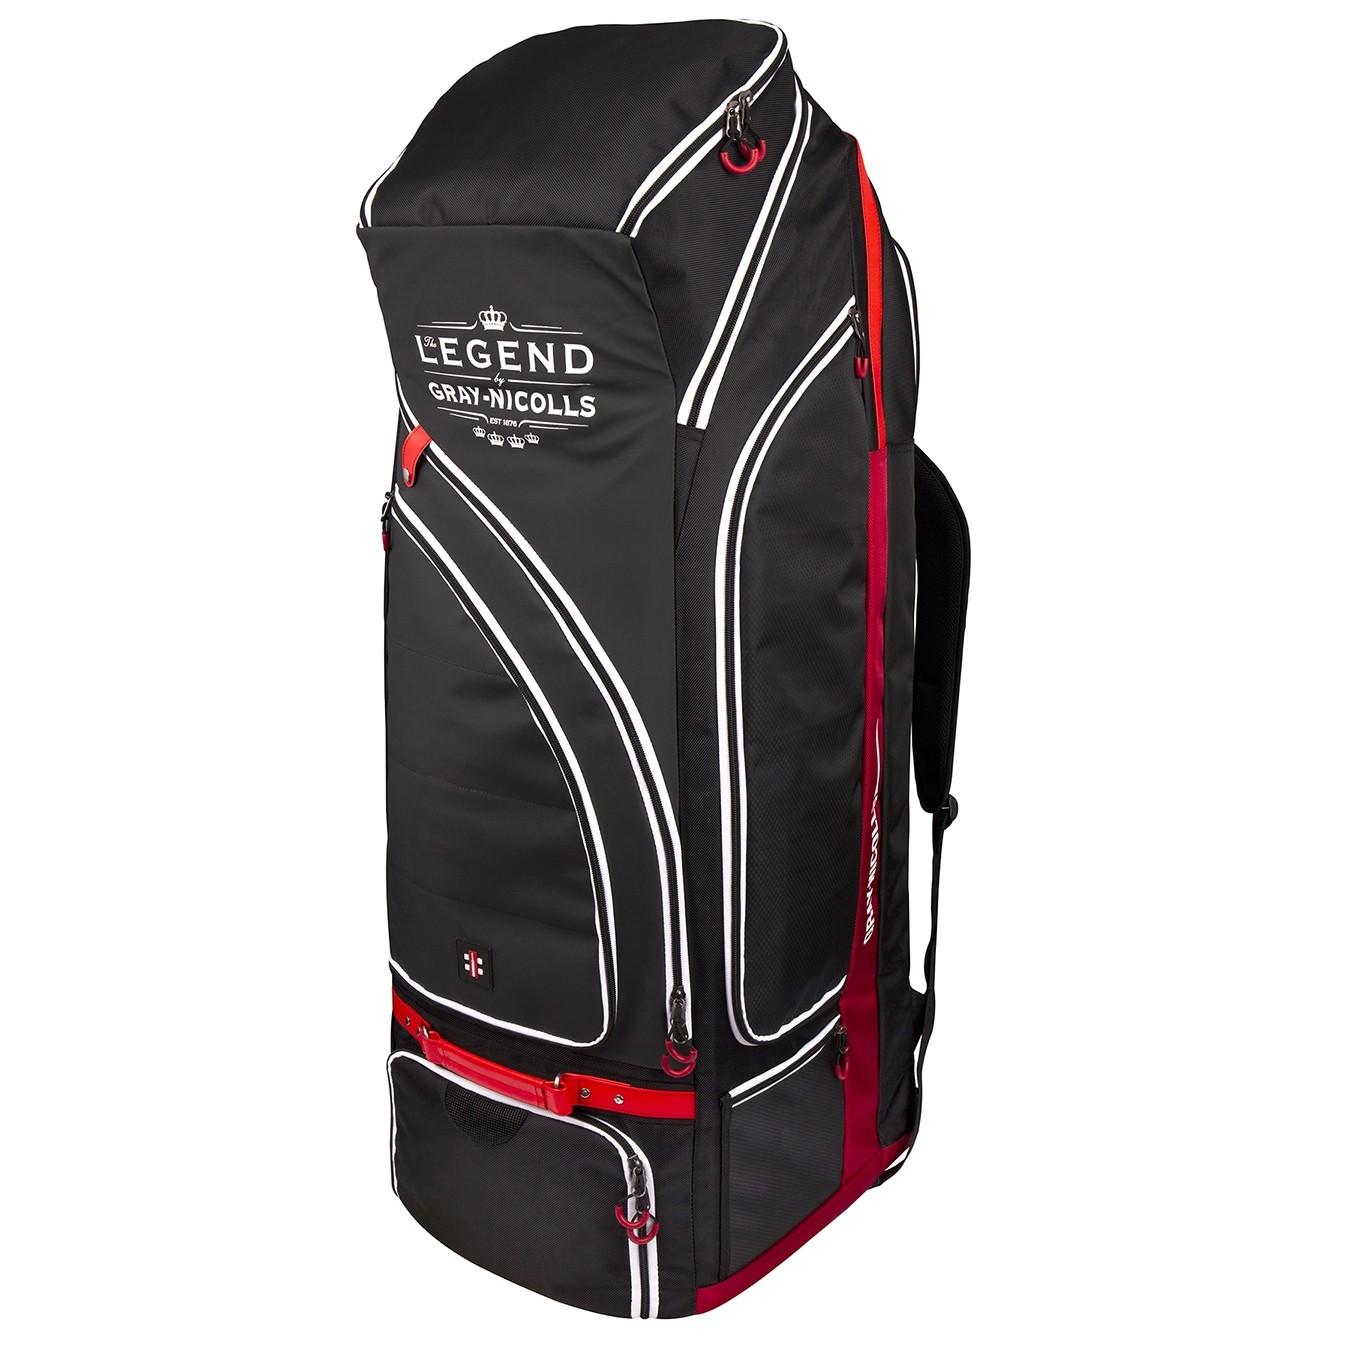 2020 Gray Nicolls Legend Duffle Cricket Bag